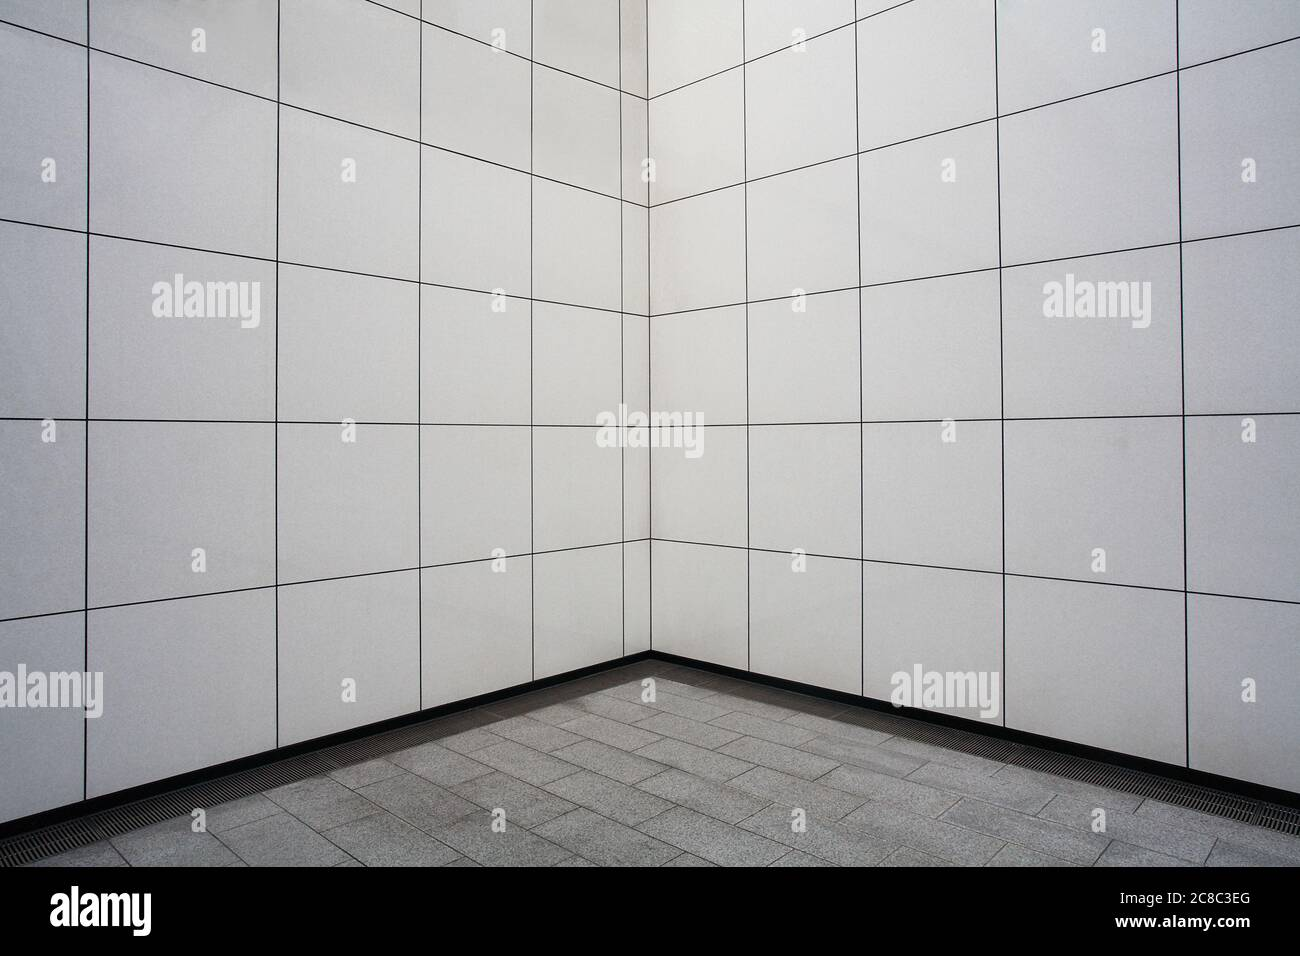 White Tile Wall In Metro Station Stock Photo Alamy